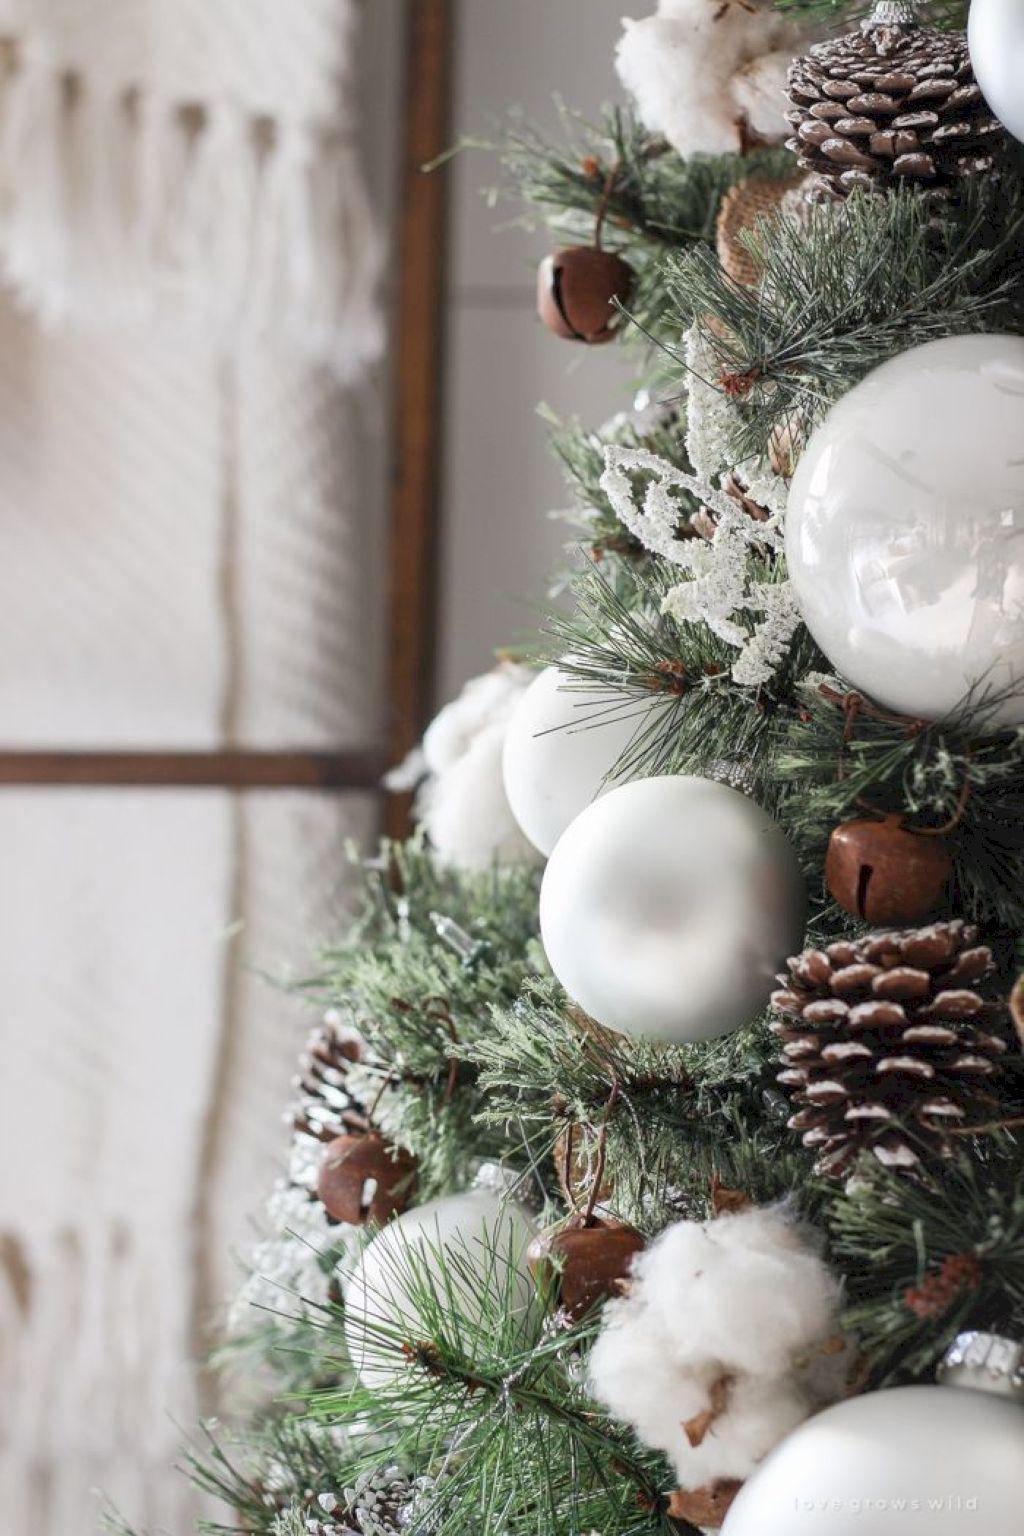 70 beautiful white christmas decor ideas on a budget on holiday rh pinterest com